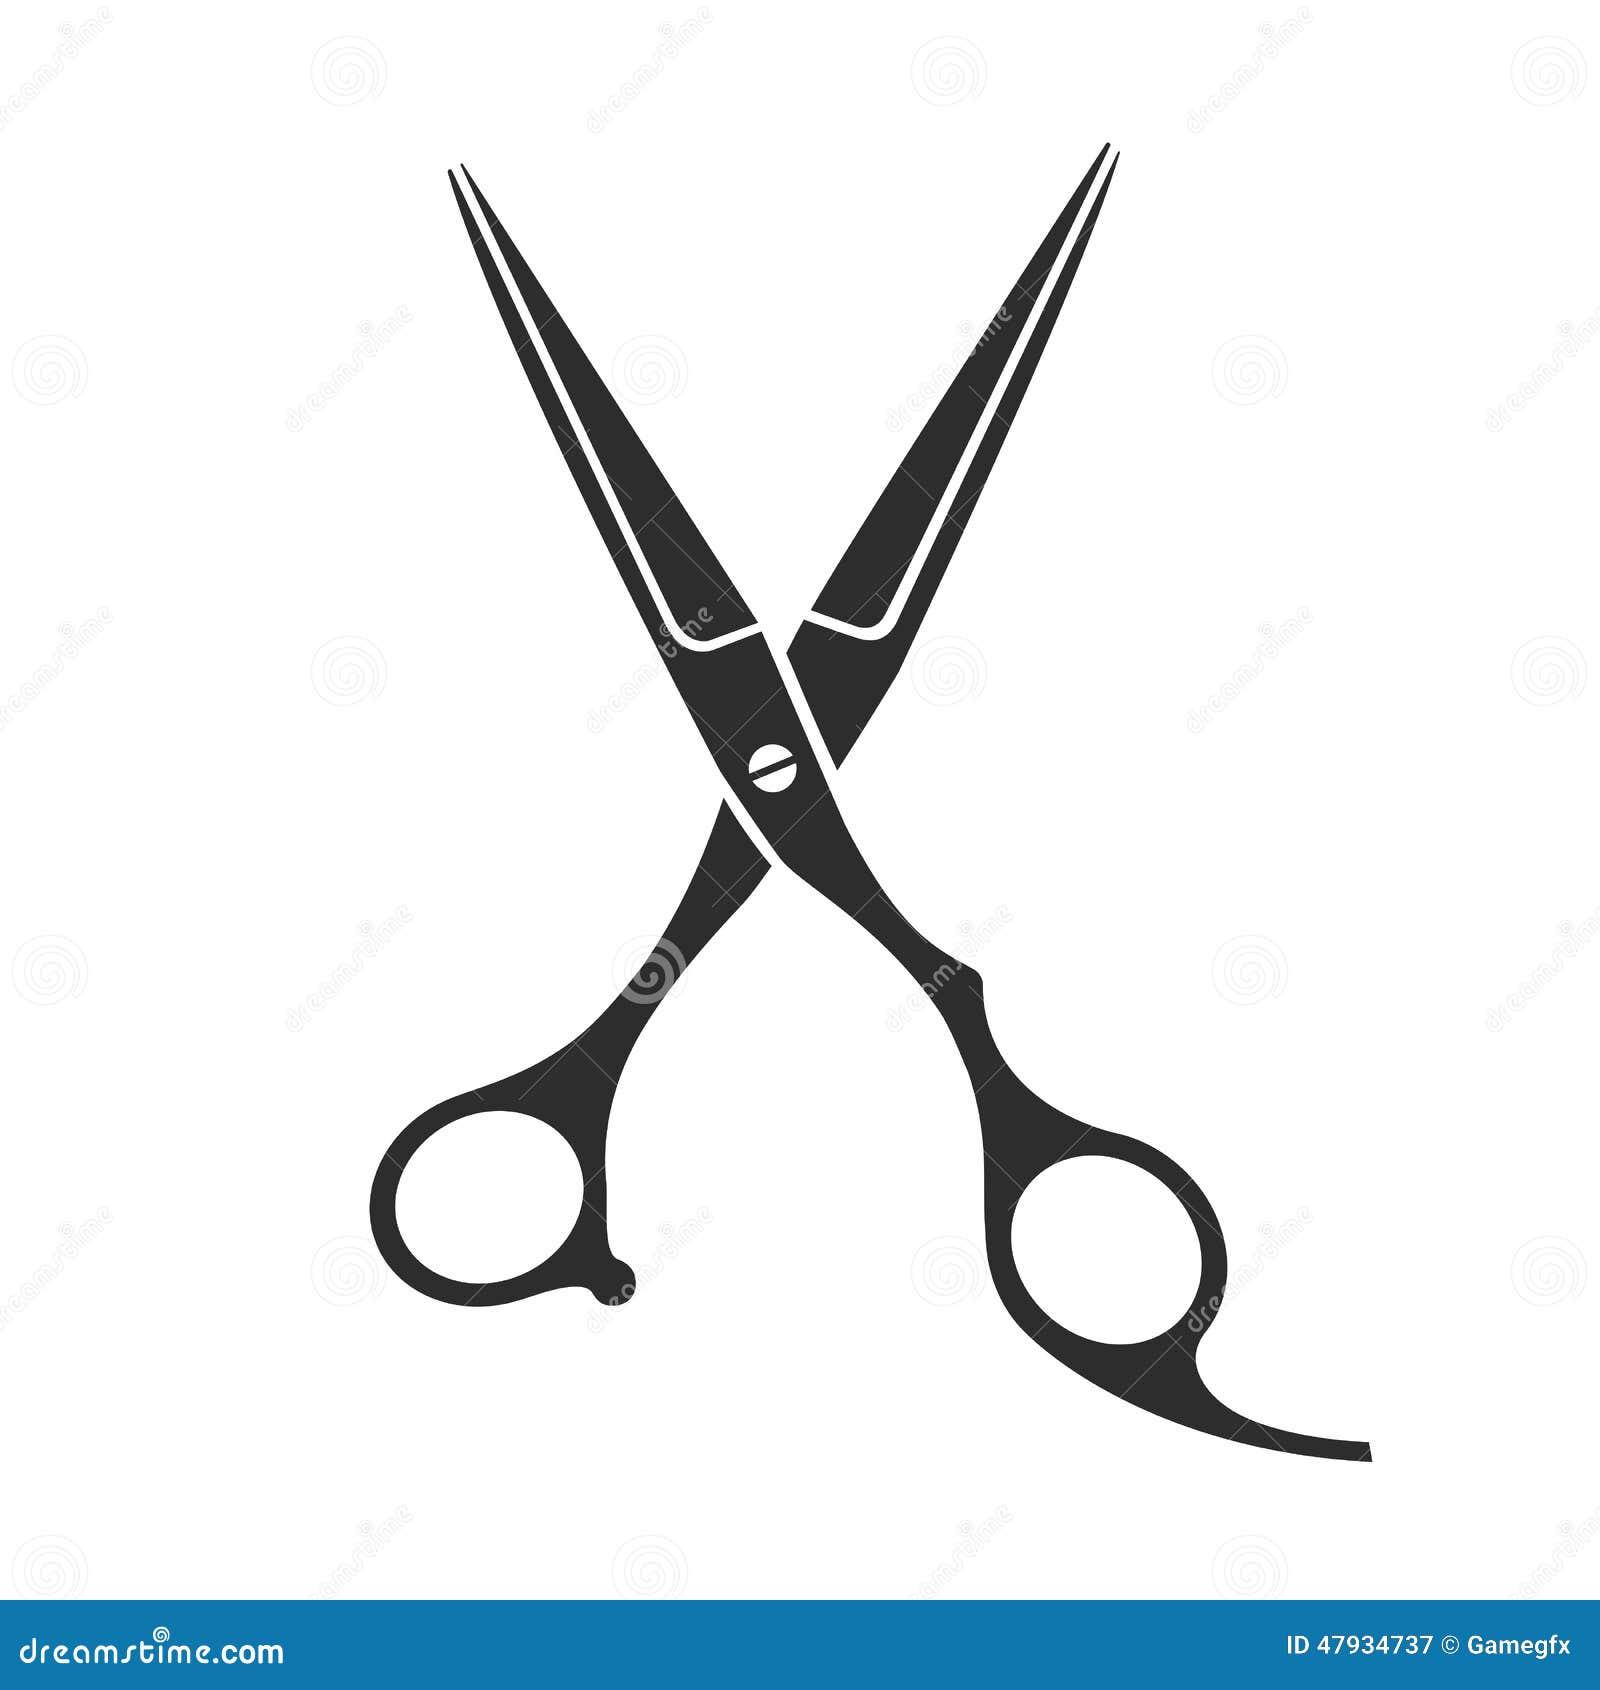 vintage barber shop scissors stock vector image 47934737 barber pole clip art color barber pole clip art blue red white